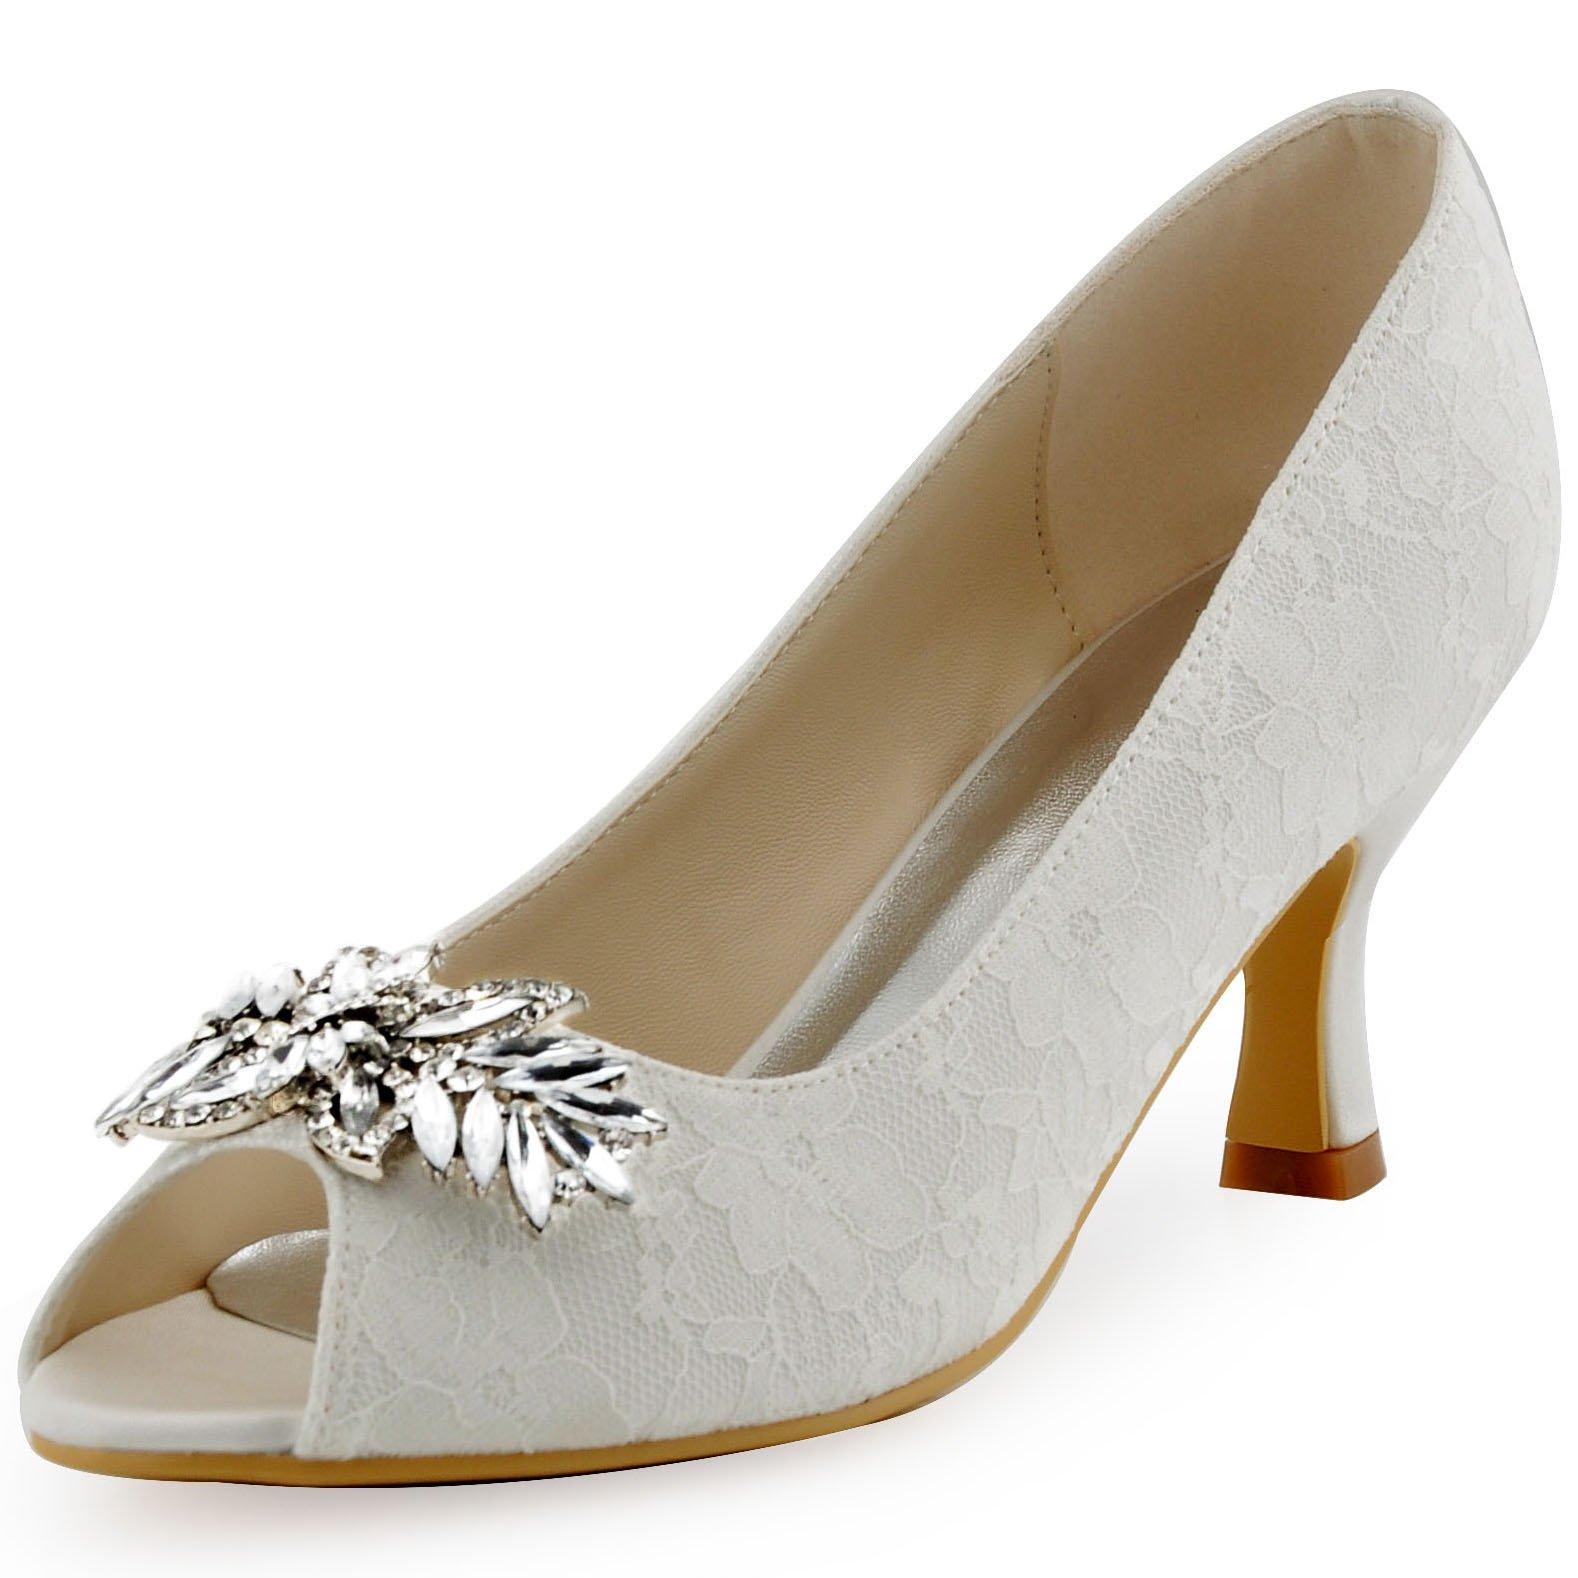 ElegantPark HP1538 Women Peep Toe Pumps Leaf Rhinestones Comfort Heel Lace Wedding Bridal Dress Shoes Ivory US 9